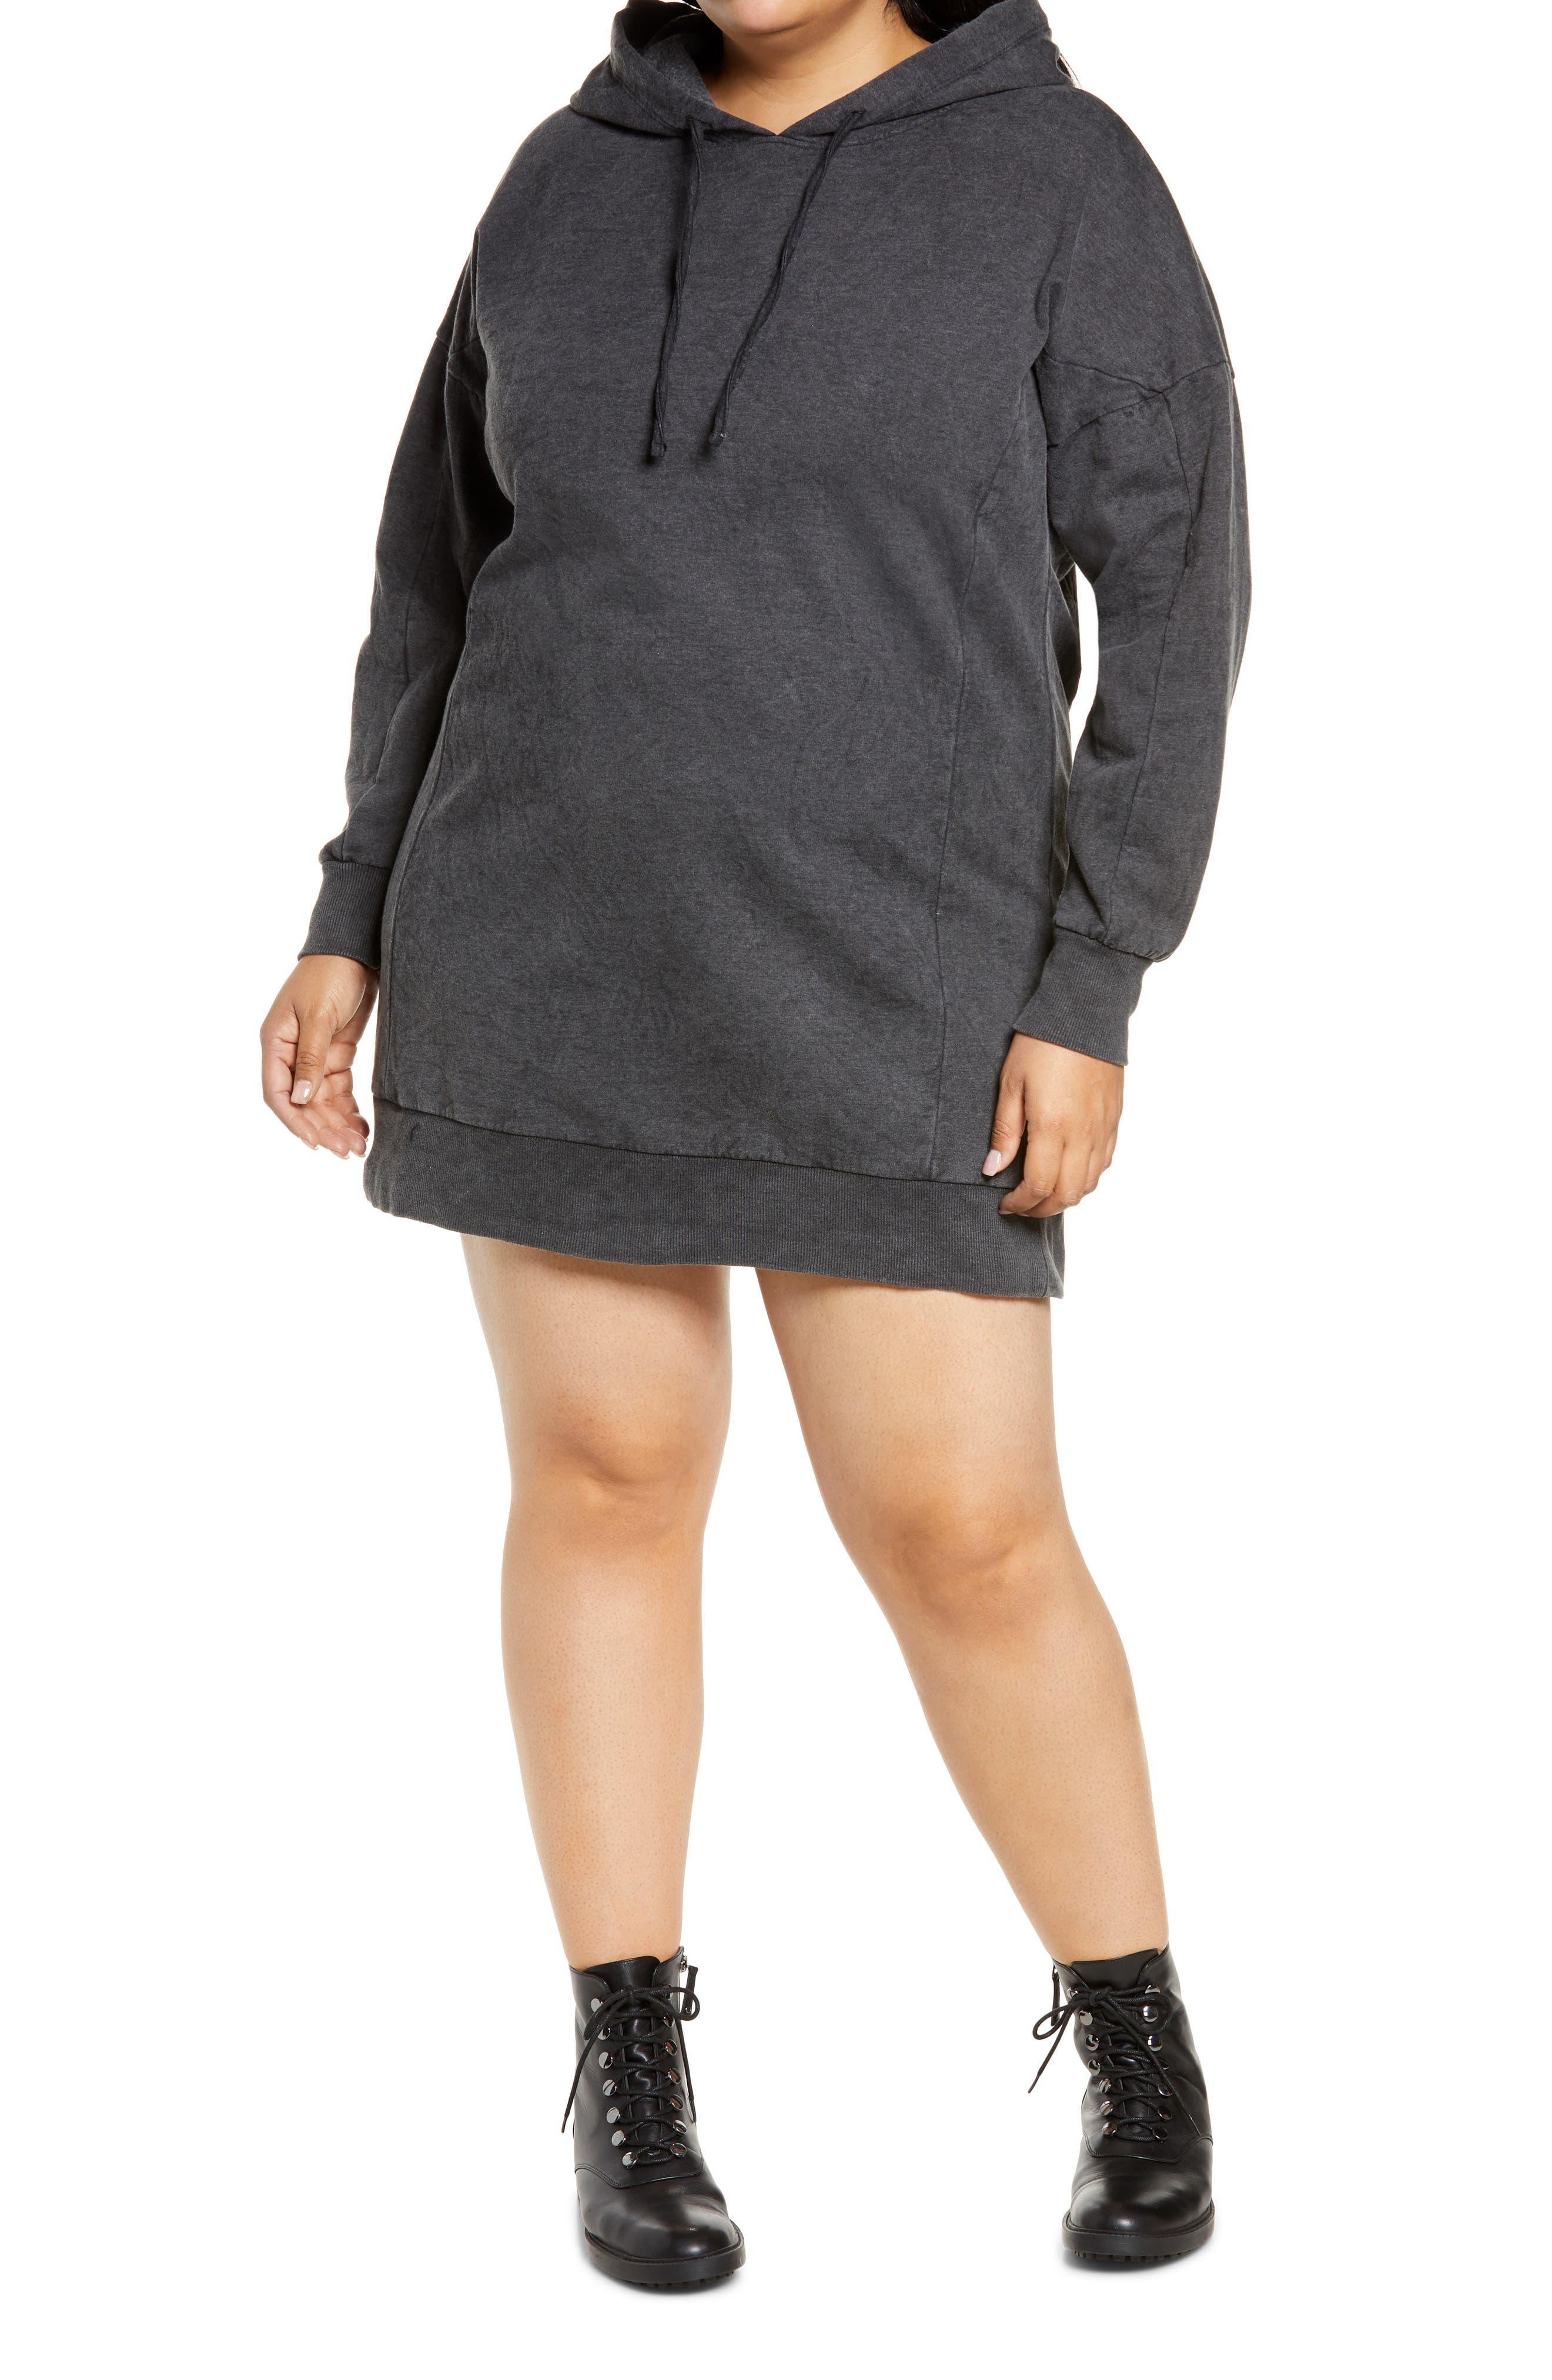 BIFUTON Women Sweatshirt Pullover Fall Winter Christmas Plus-Size O Neck Long Sleeve Tops Sweaters